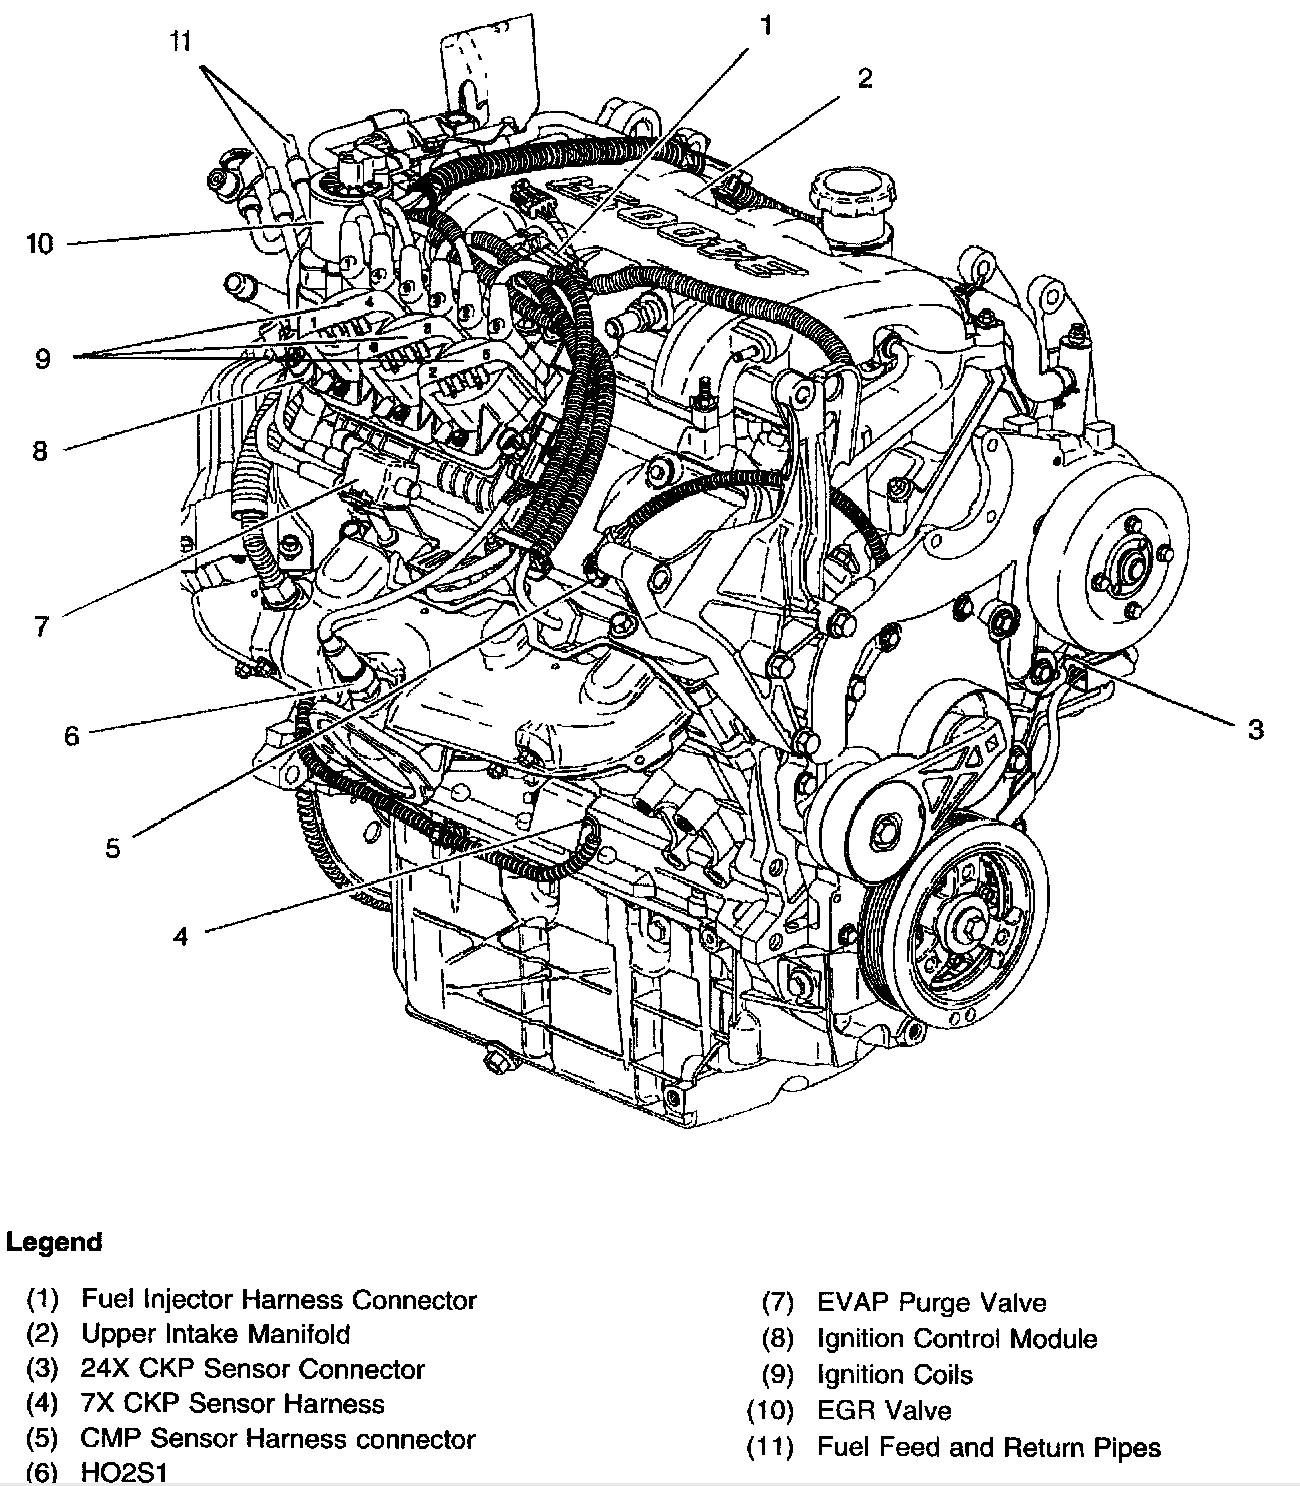 Toyota 4runner Engine Diagram toyota Engine Schematics Wiring Diagram Paper Of Toyota 4runner Engine Diagram 1995 toyota T100 Dx 4×4 Xtracab 5 Spd Manual W Od